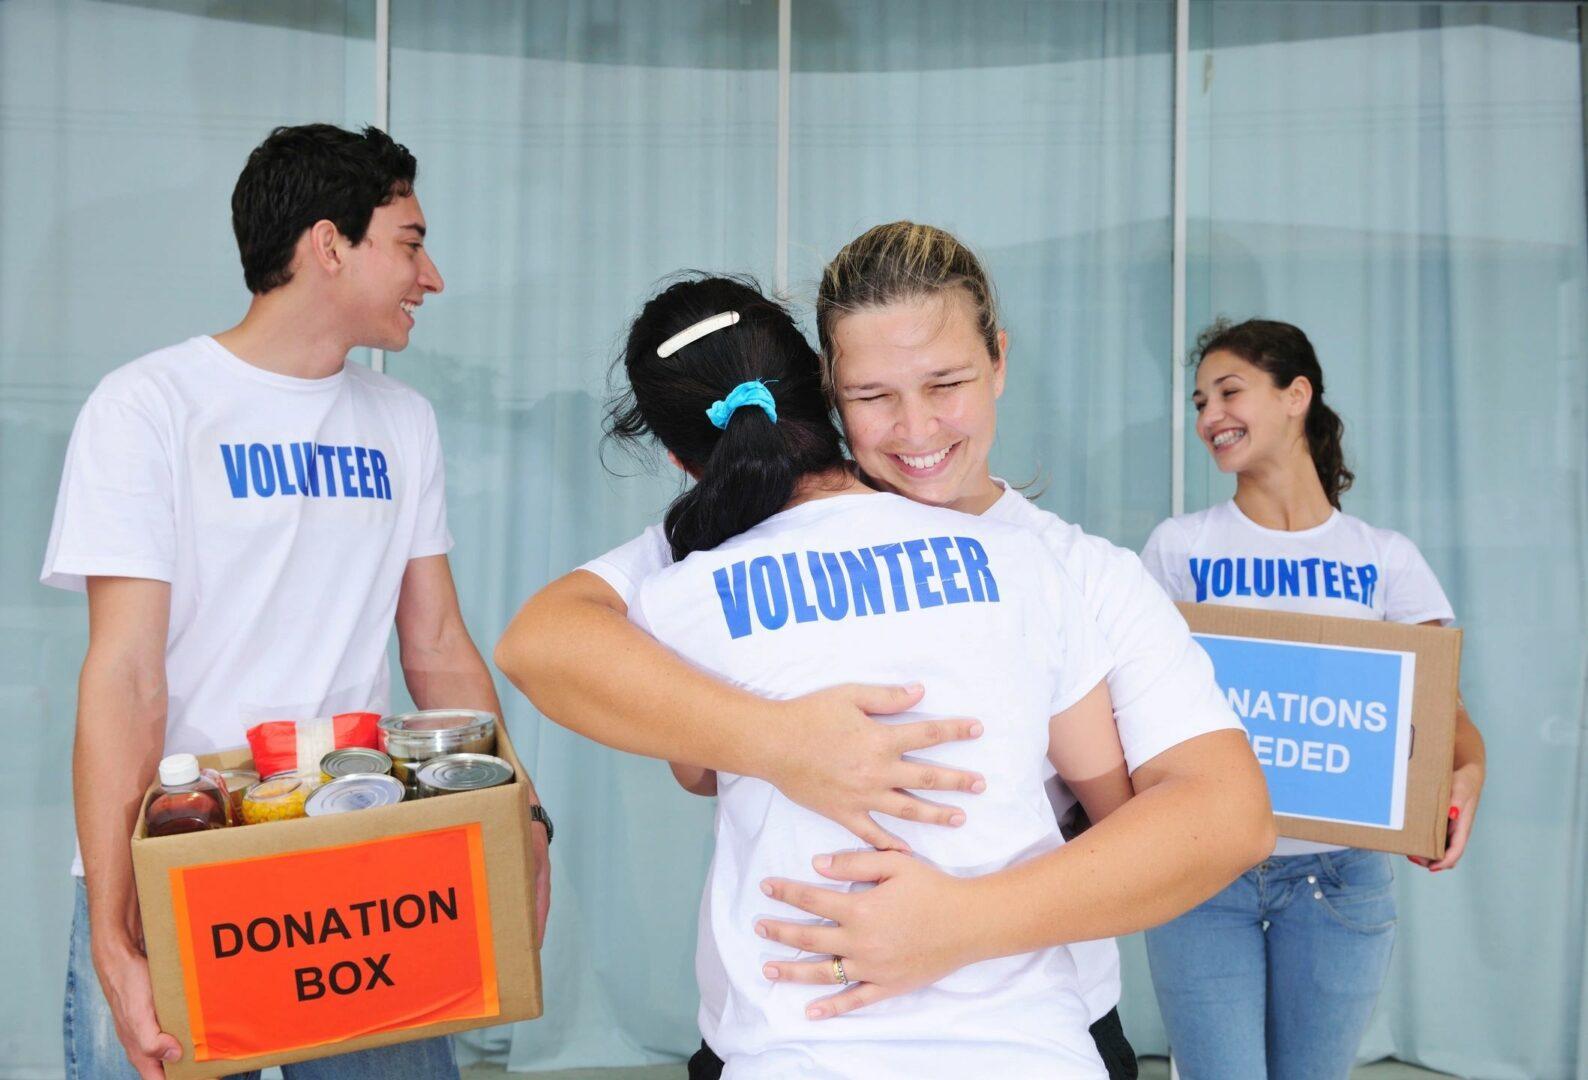 Volunteer_Non-Profit_Placeholder